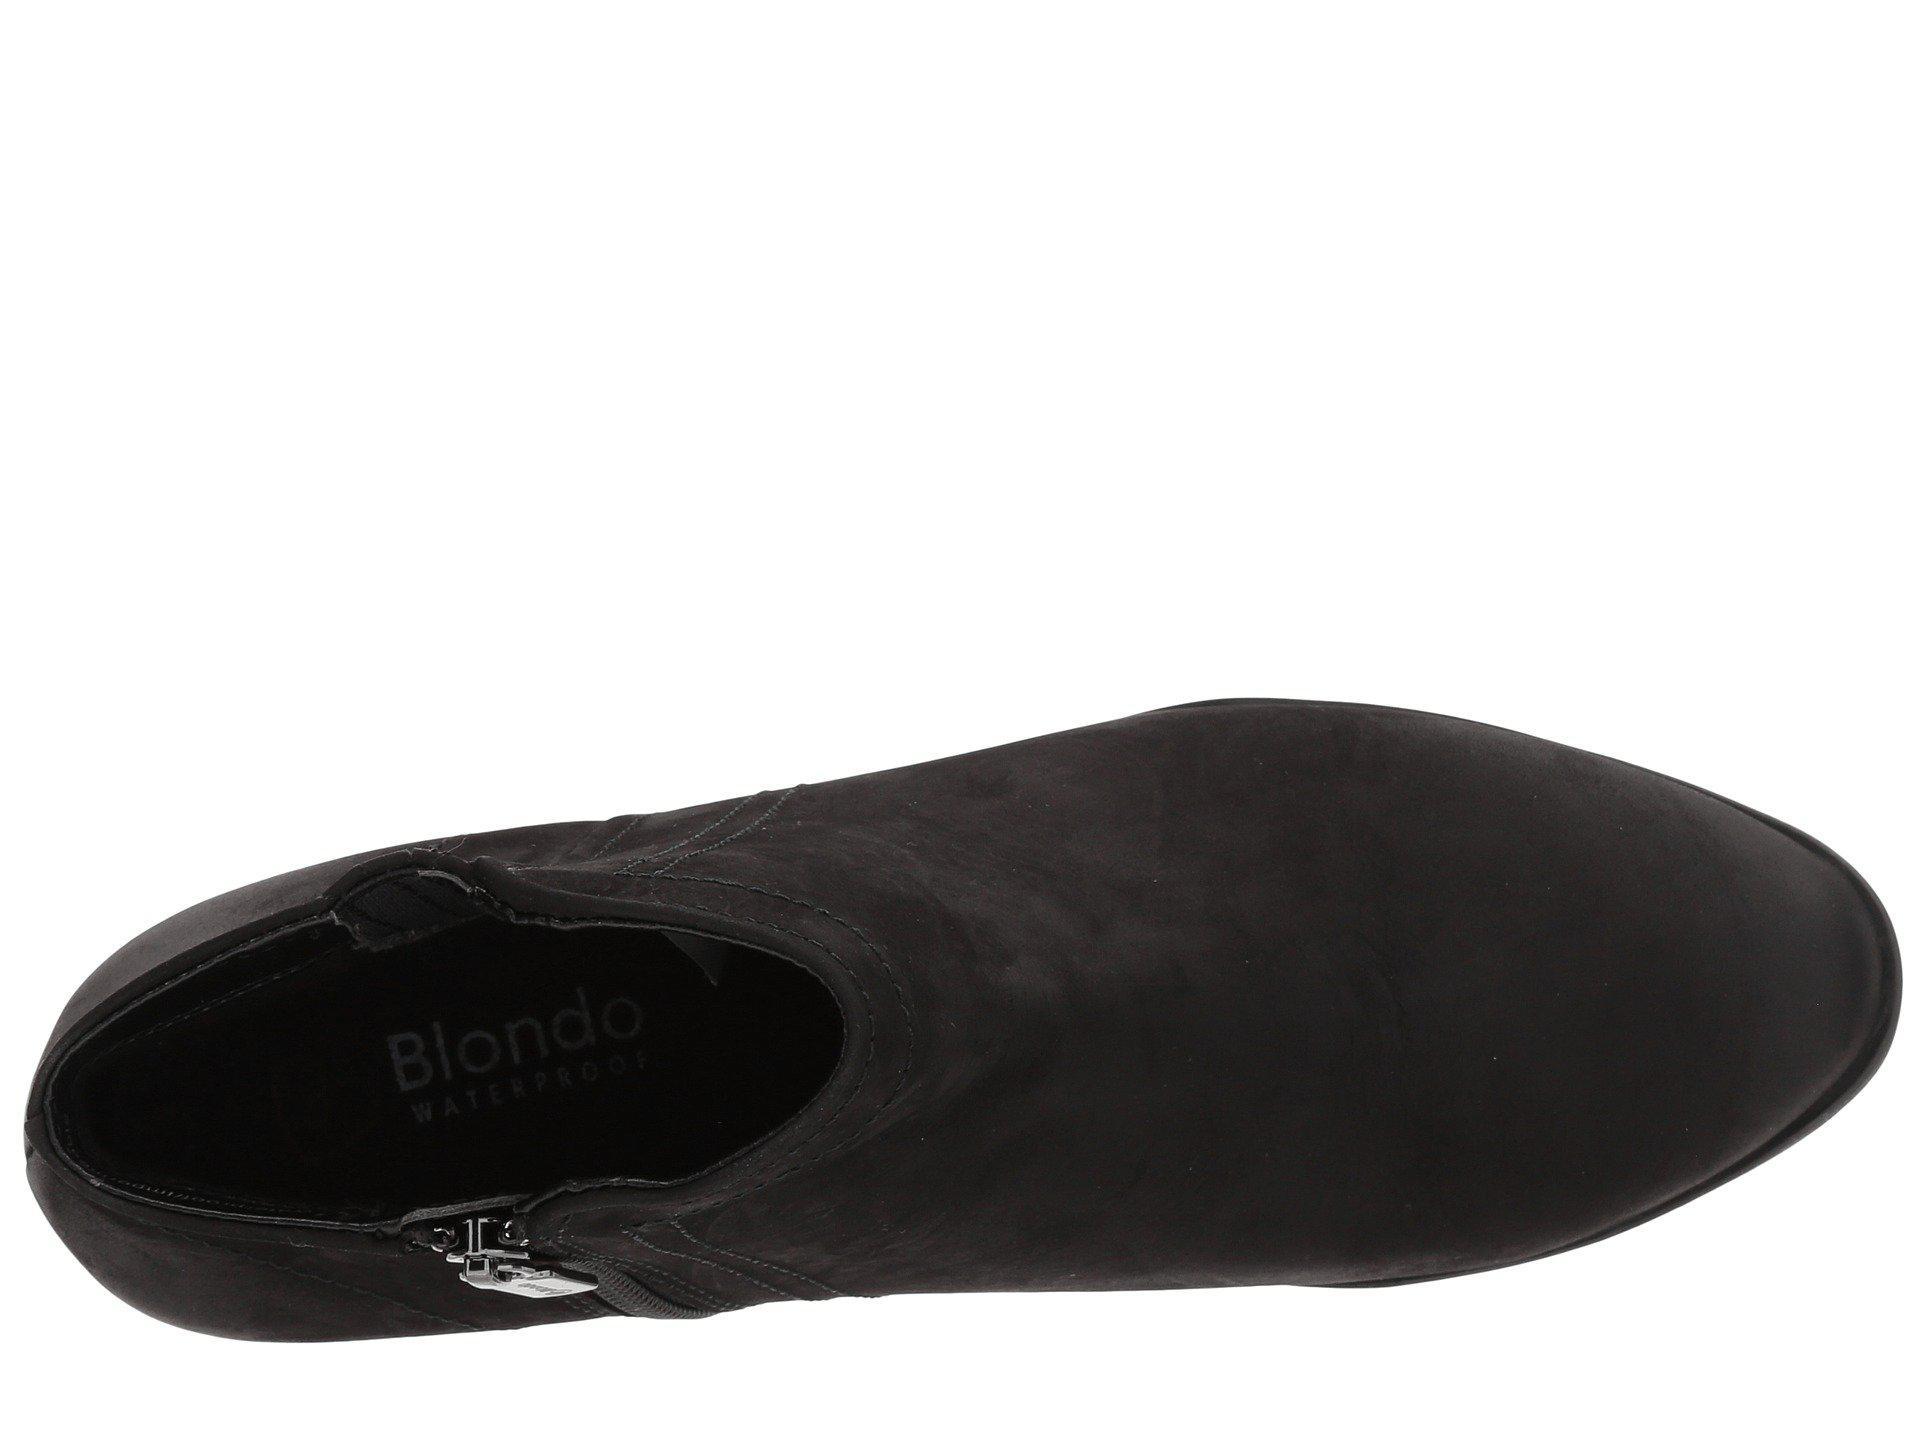 87580228cc28 Blondo - Black Valli Waterproof Bootie (mushroom Nubuck) Women s Boots -  Lyst. View fullscreen